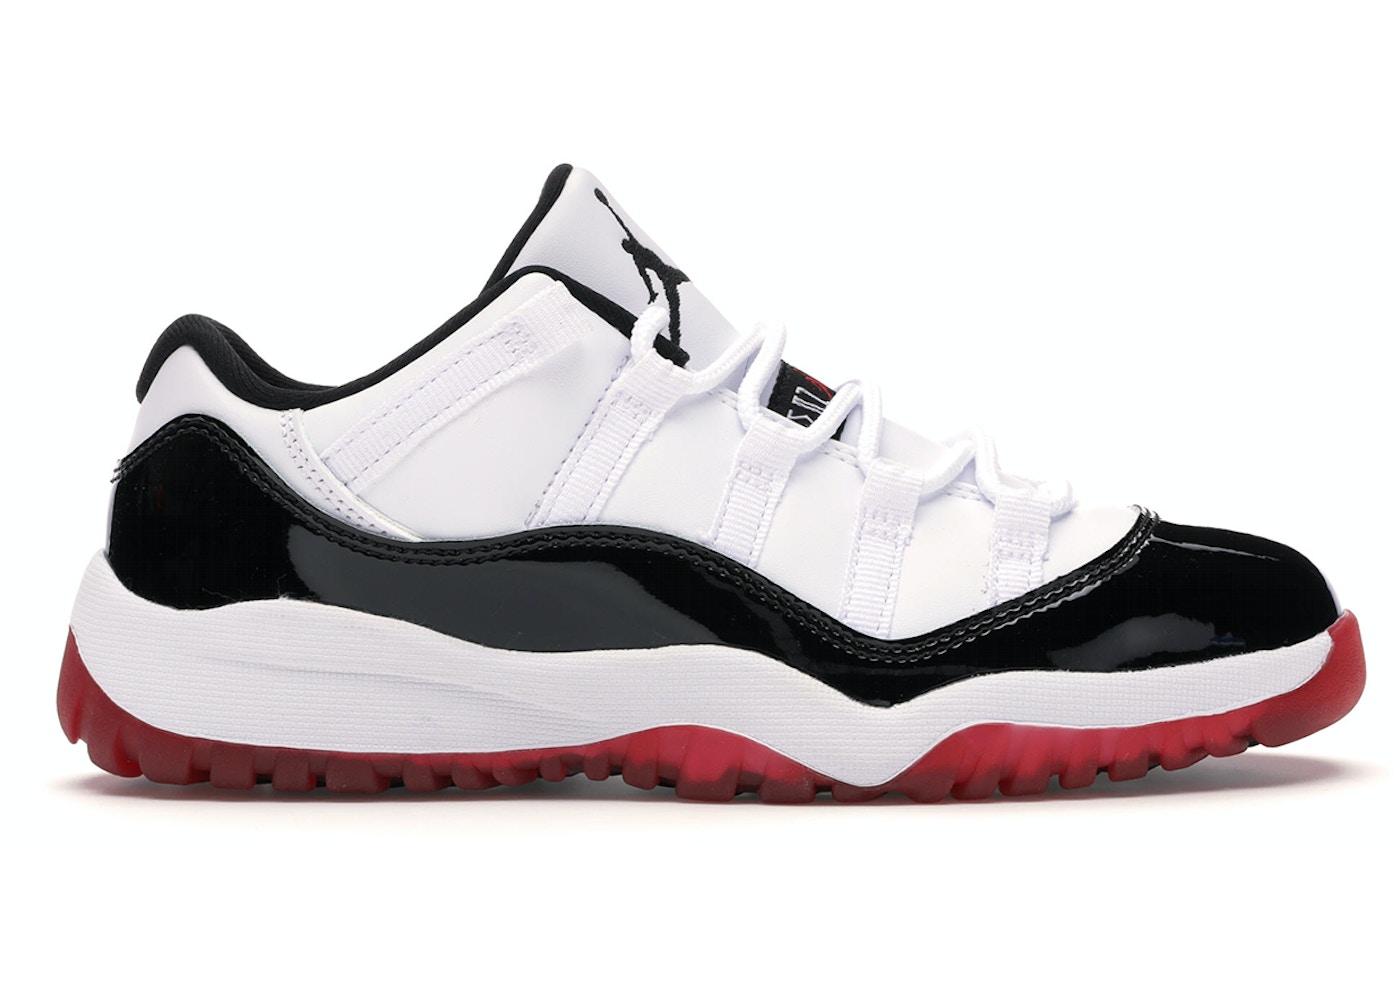 Jordan 11 Retro Low Concord Bred Ps 505835 160